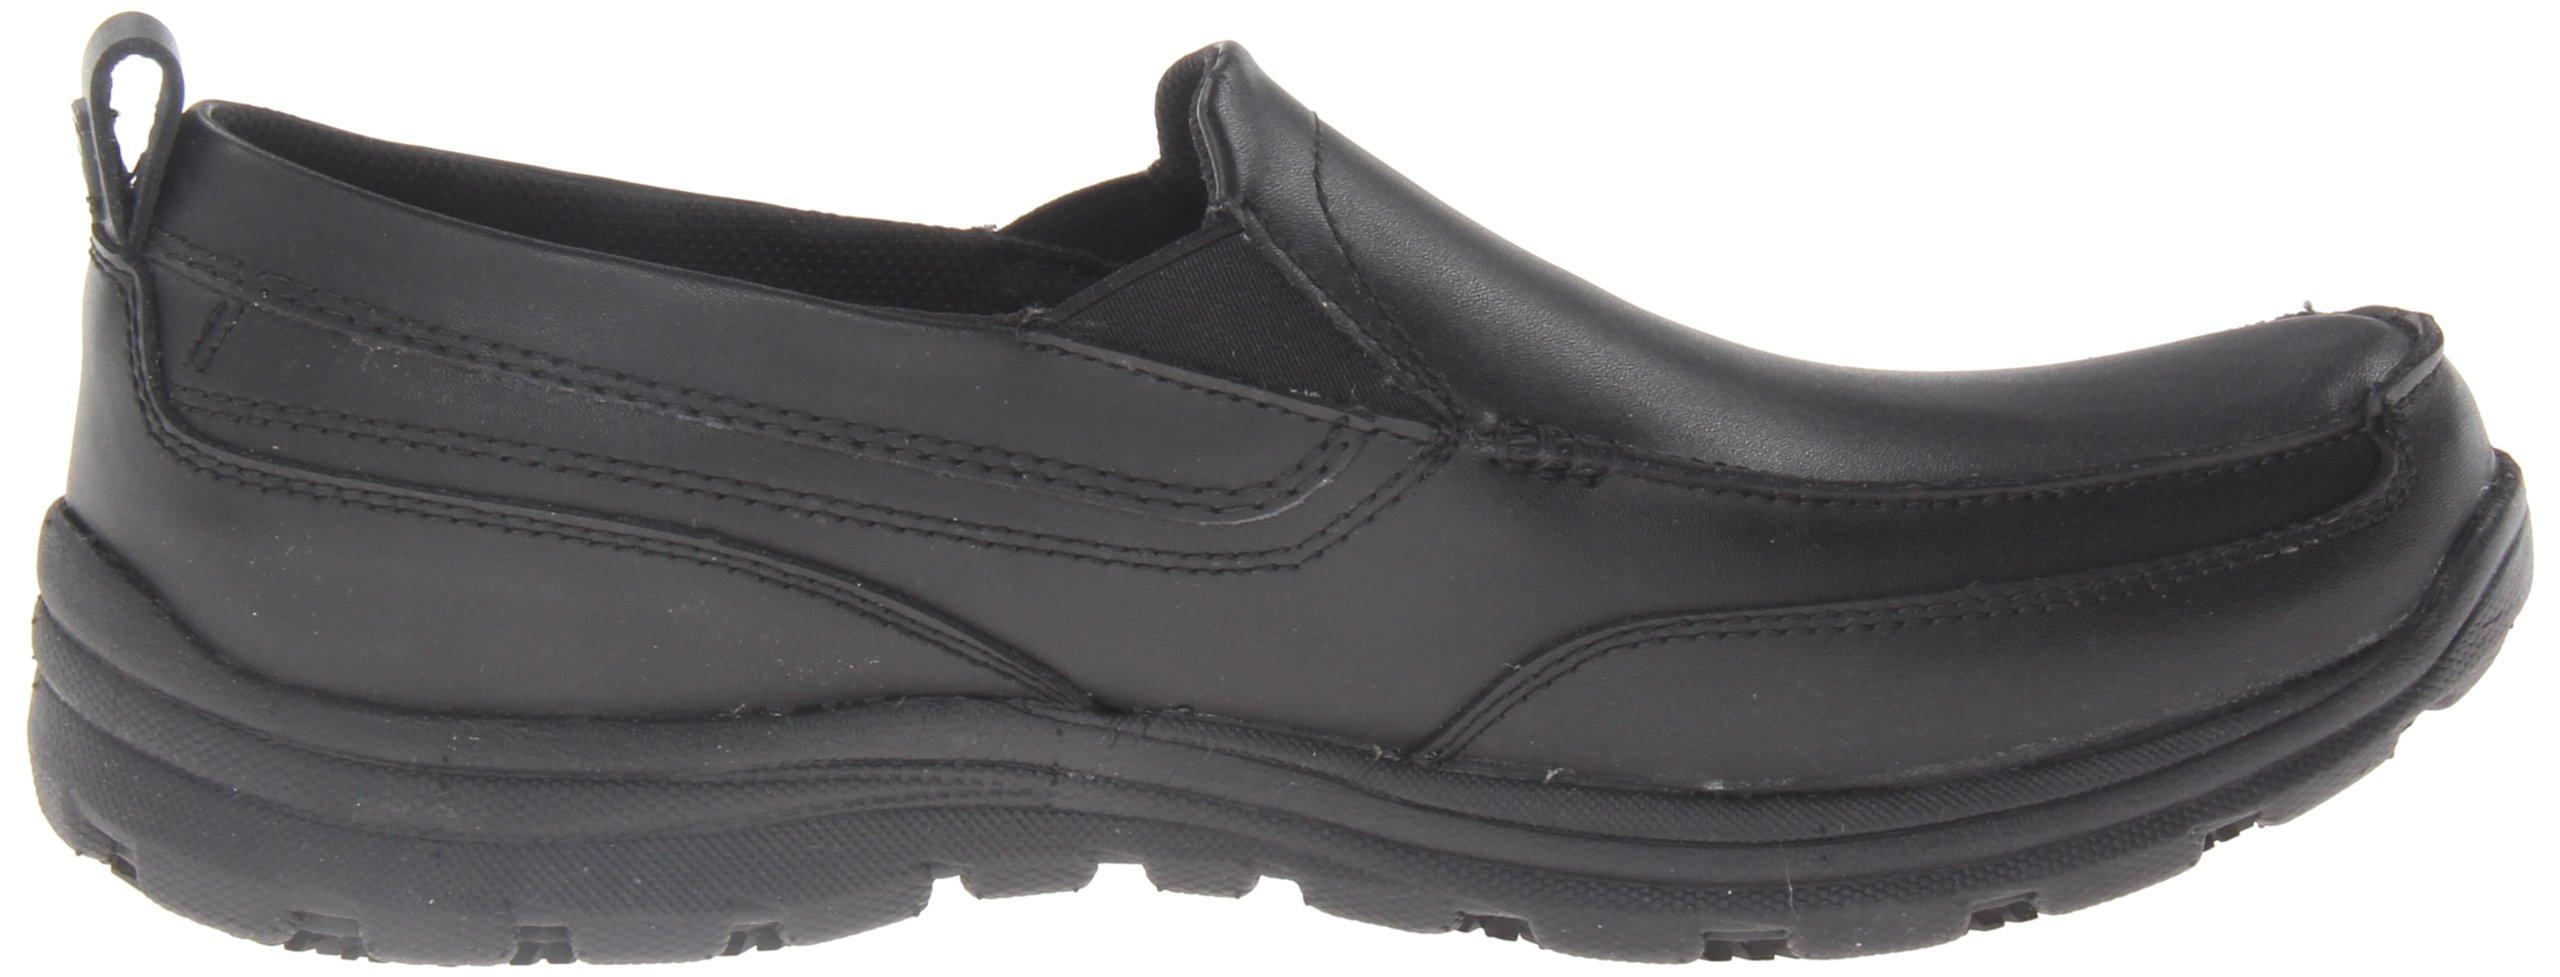 Skechers for Work Men's Hobbes Relaxed Fit Slip Resistant Work Shoe, Black, 11.5 M US by Skechers (Image #6)